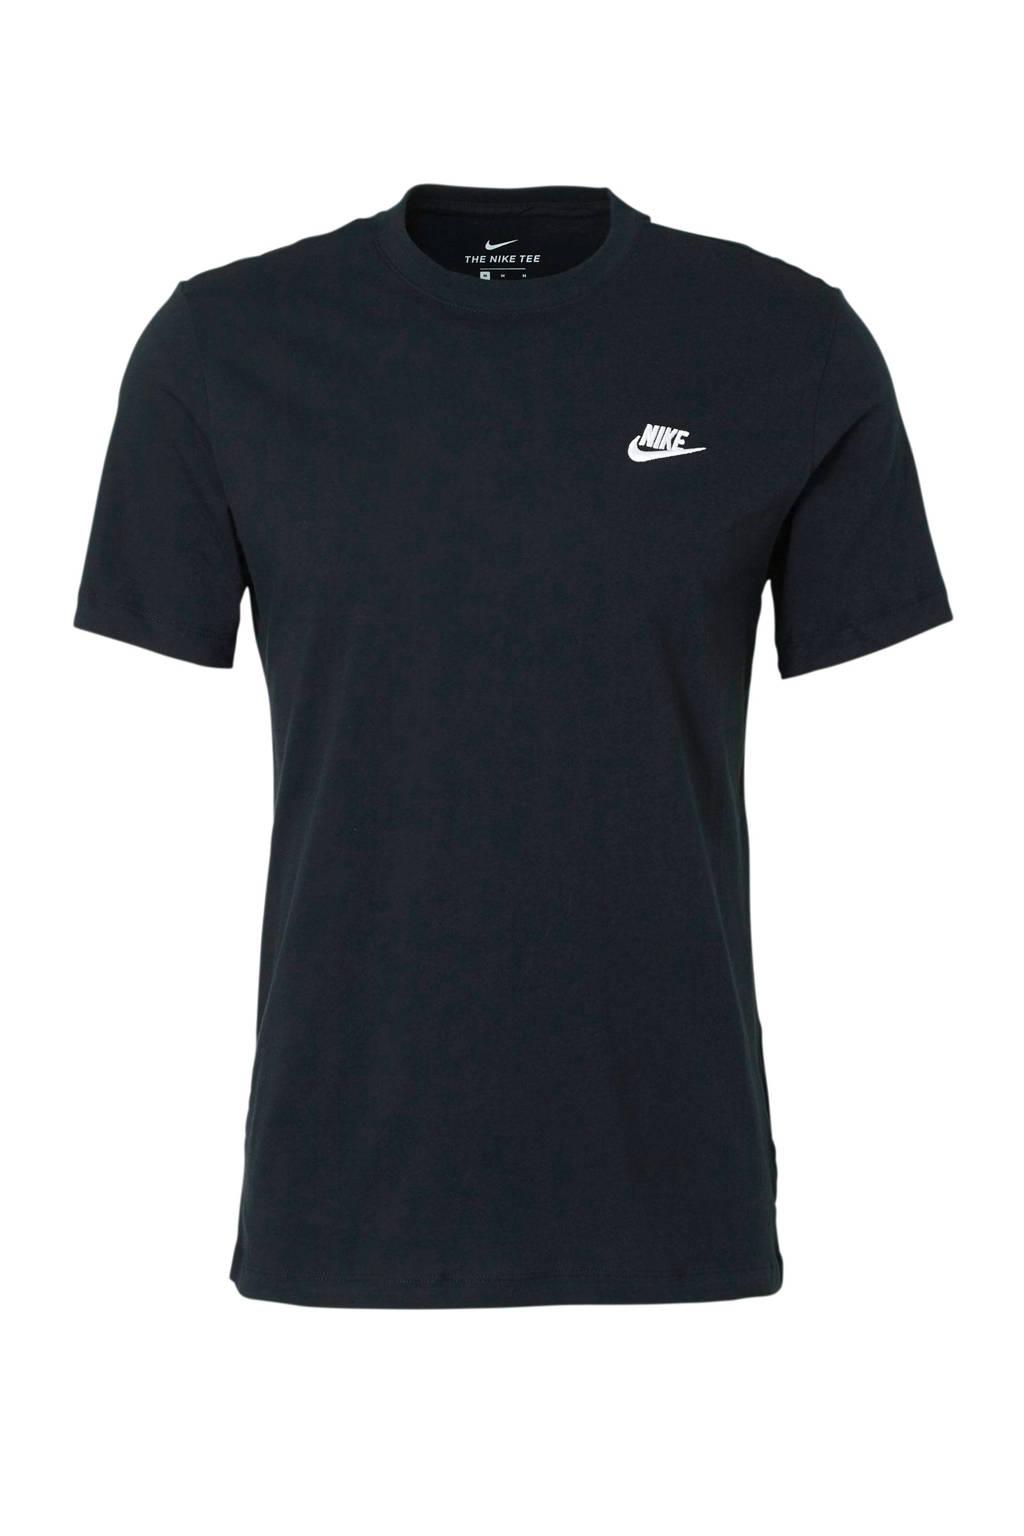 Nike T-shirt, Zwart